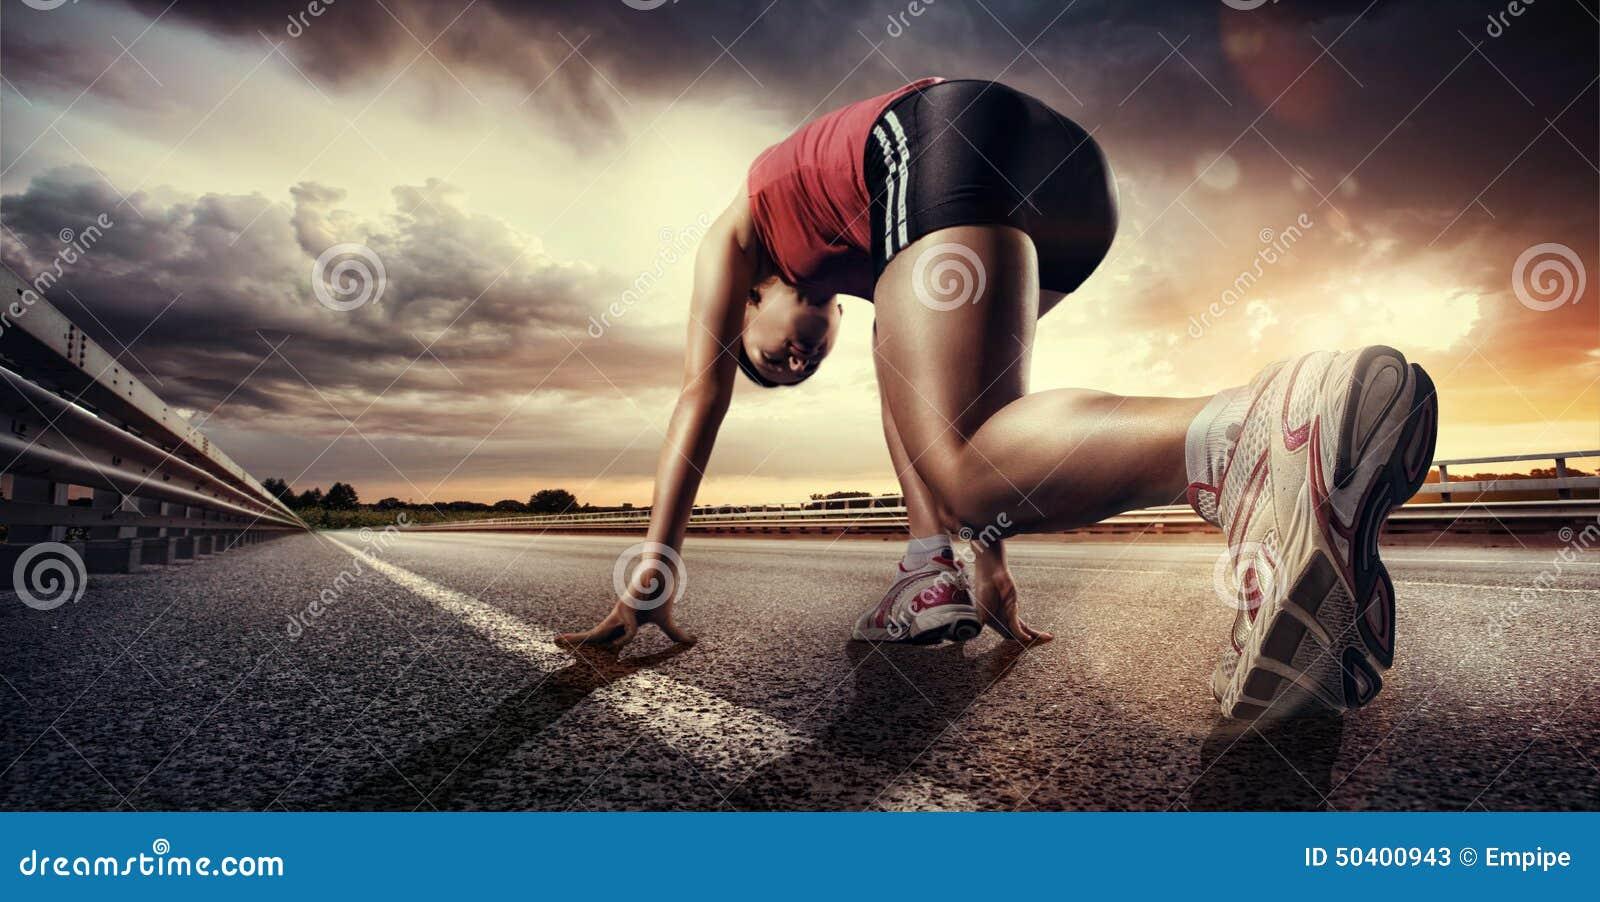 Download Starting runner stock image. Image of motion, marathon - 50400943